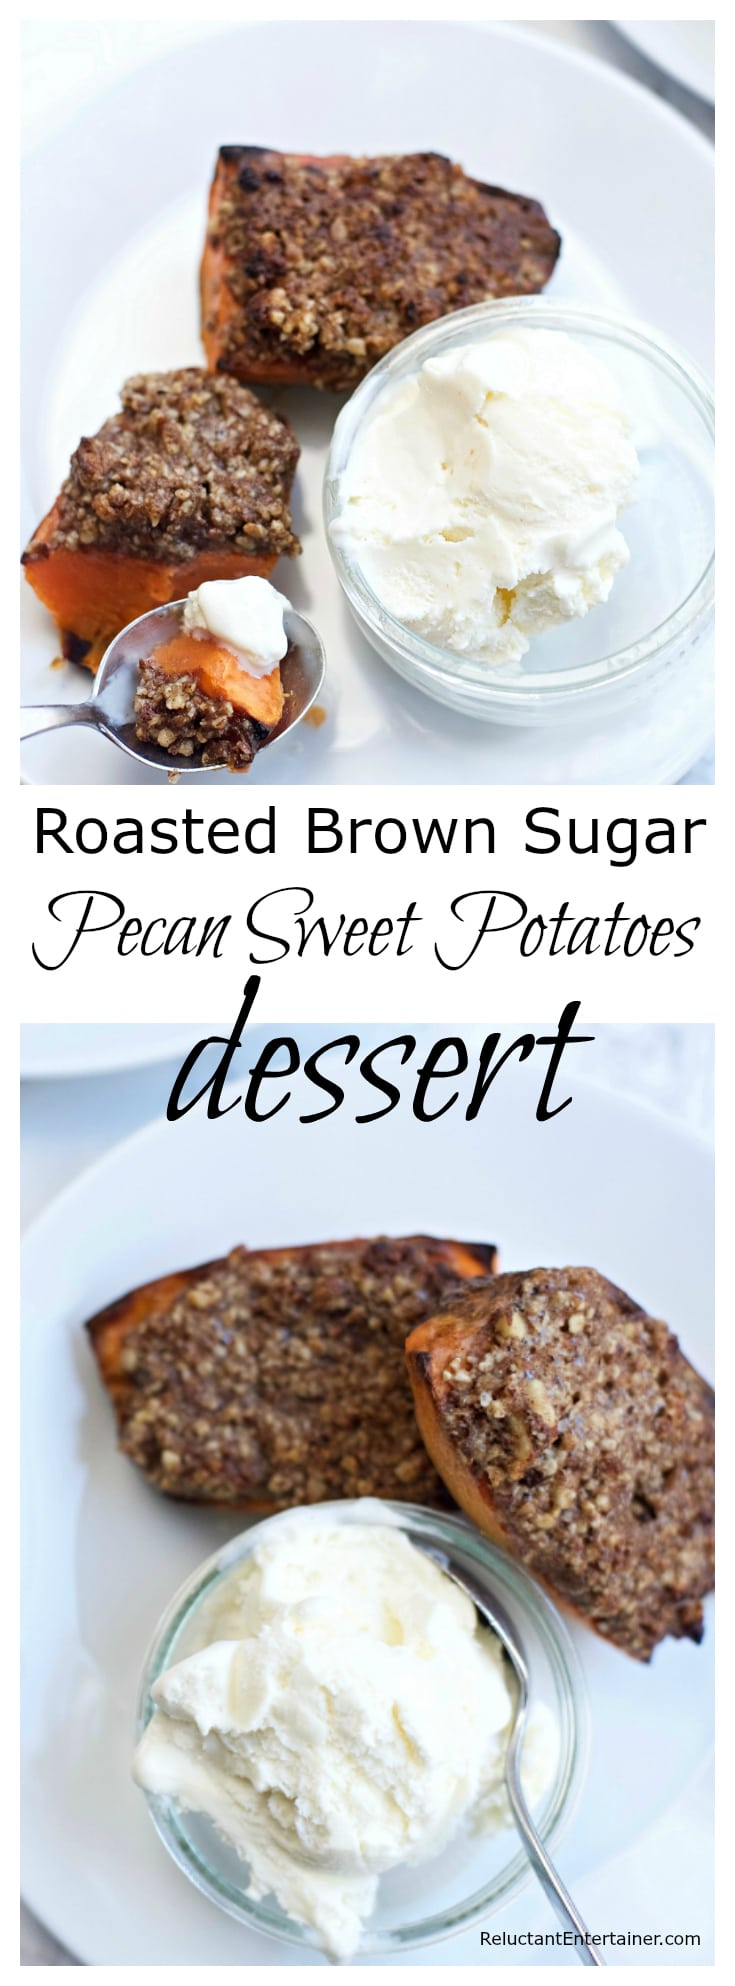 Roasted Brown Sugar Pecan Sweet Potatoes Dessert